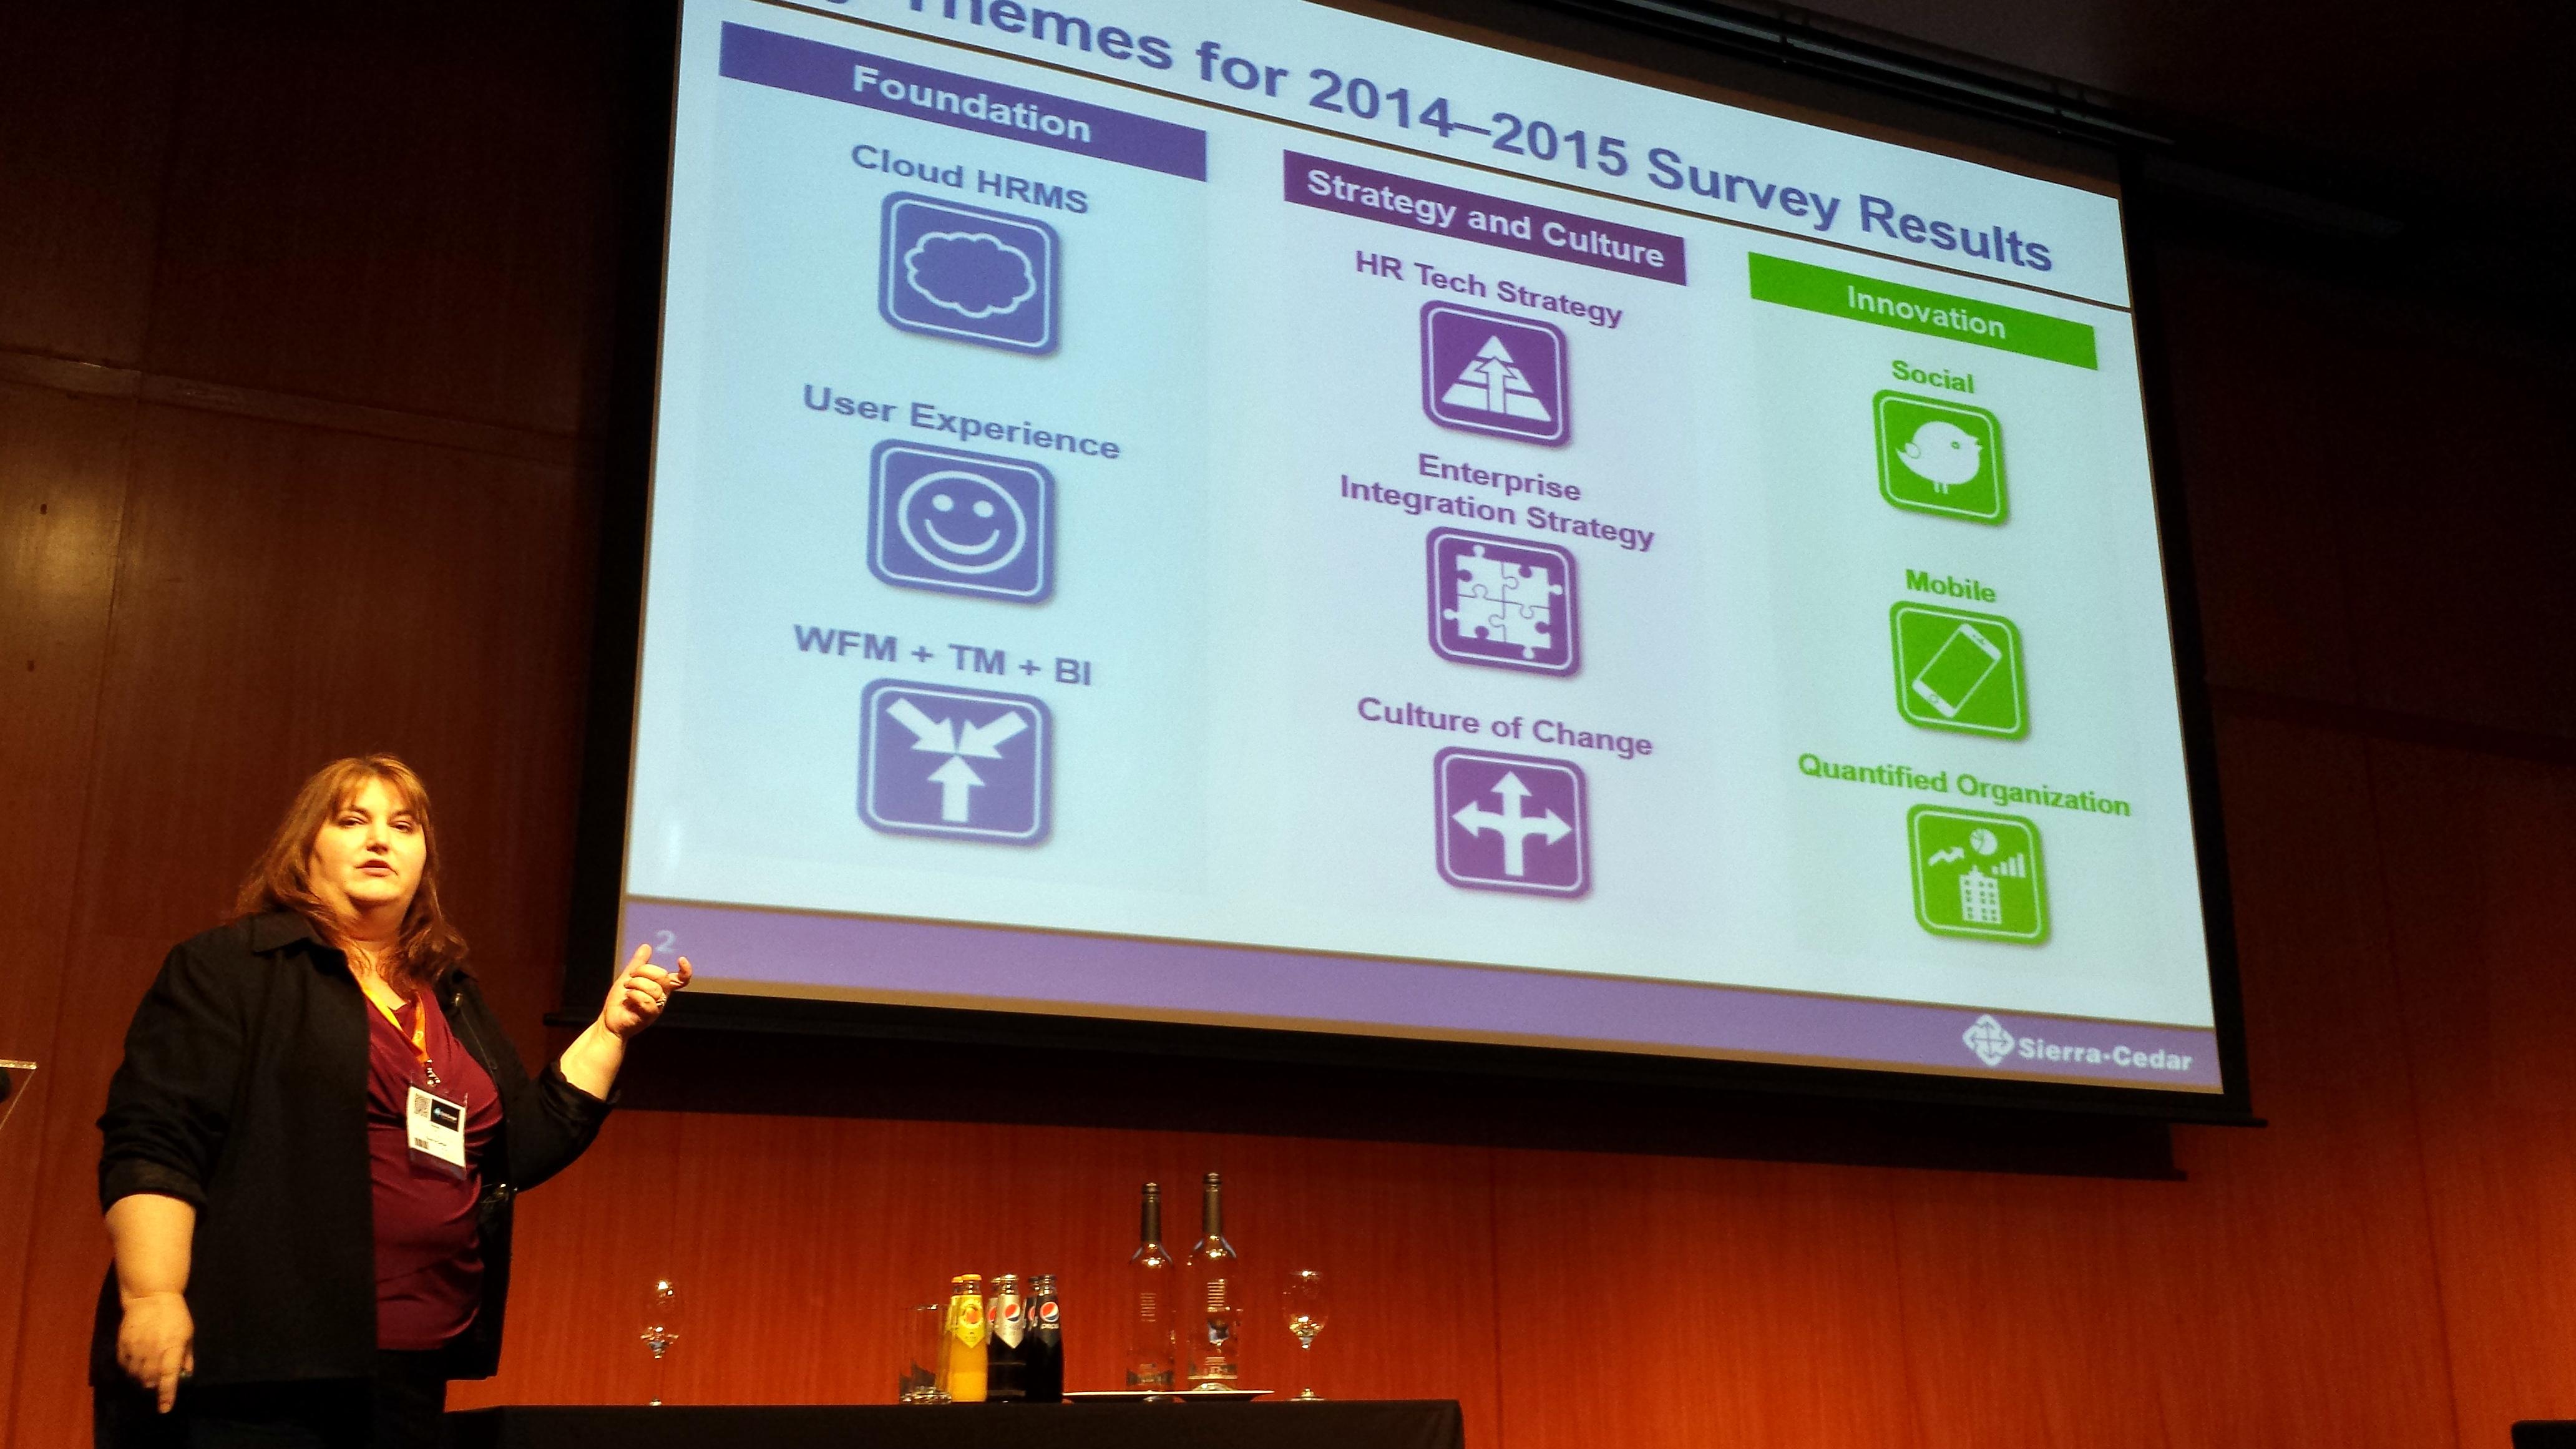 Stacey-Harris-Sierra-Cedar-Presentation-@-HR-Tech-Europe-2014